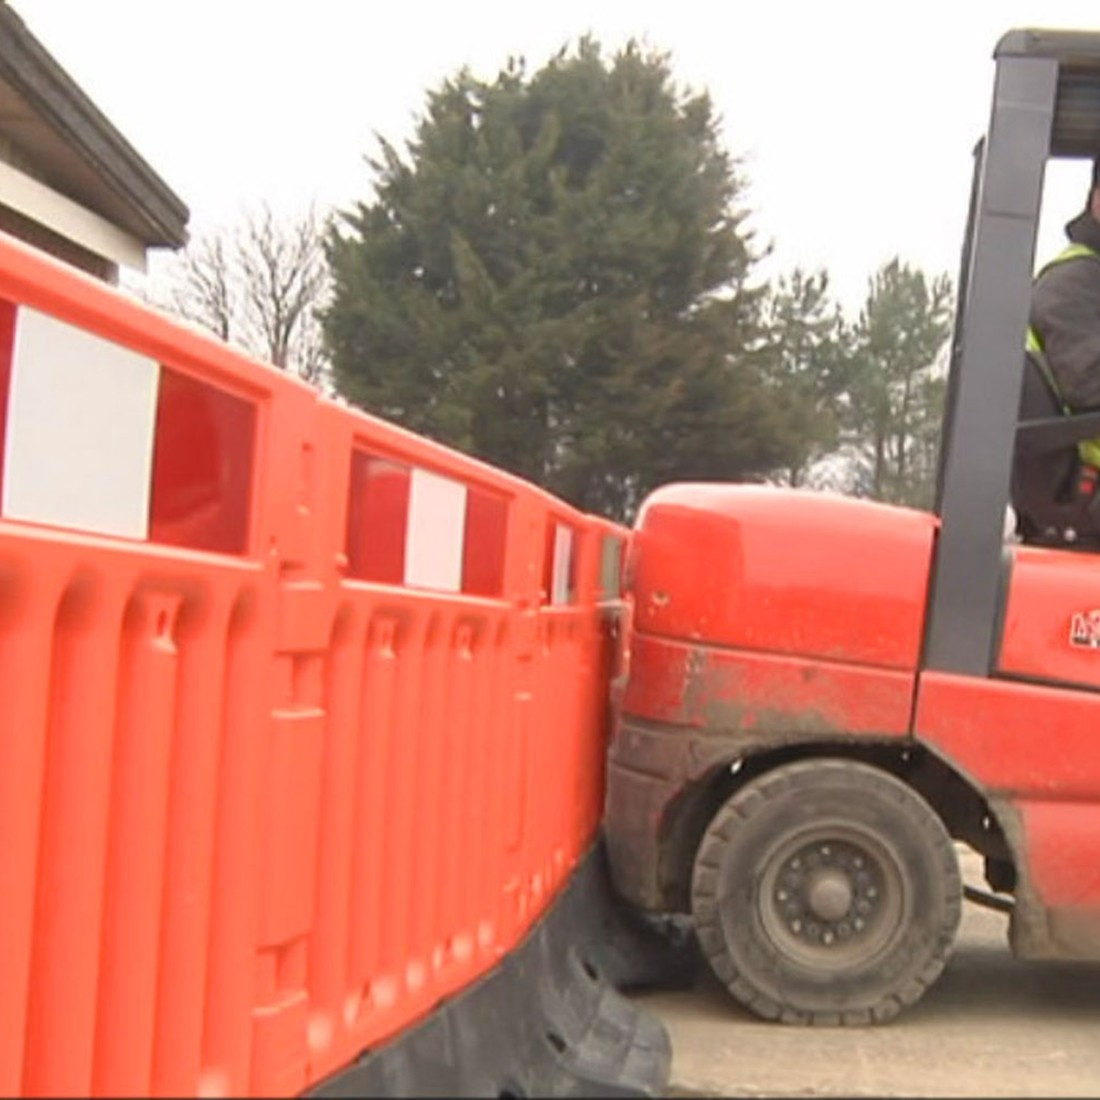 Oxford strongwall plastic barrier orange pallet of